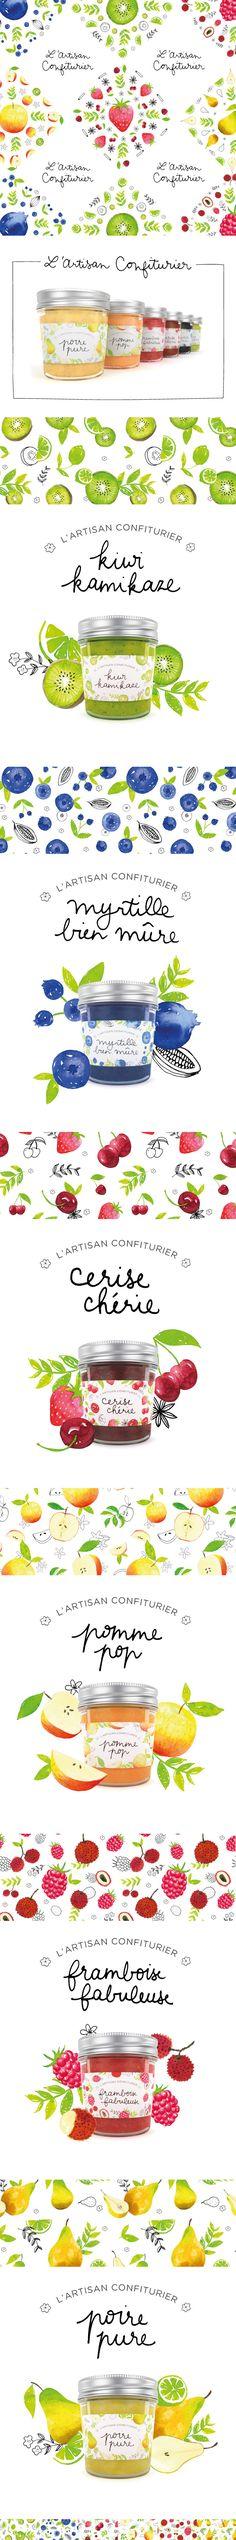 L'Artisan Confiturier - Illustrated Jam Packaging on Behance